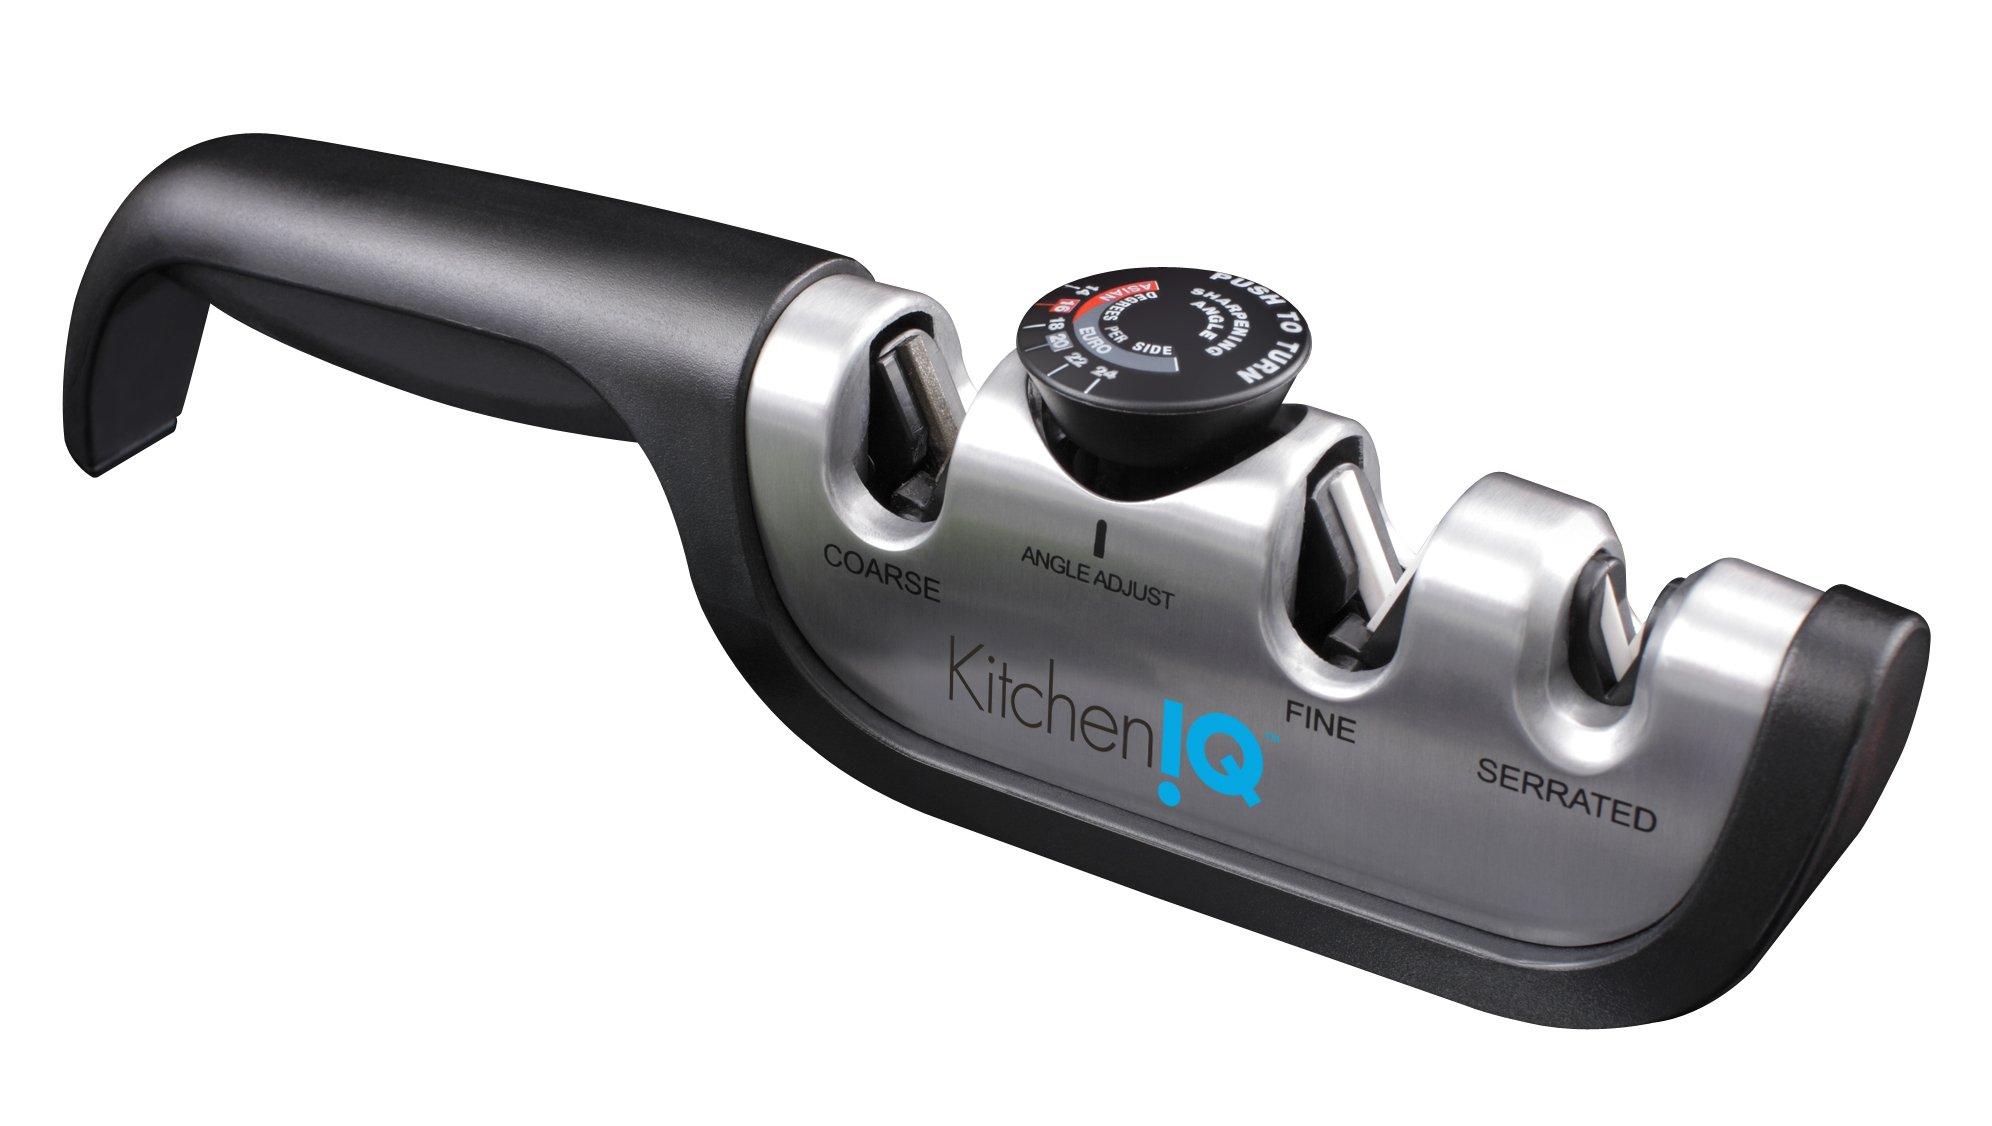 KitchenIQ 50146 Angle Adjust Adjustable Manual Sharpener